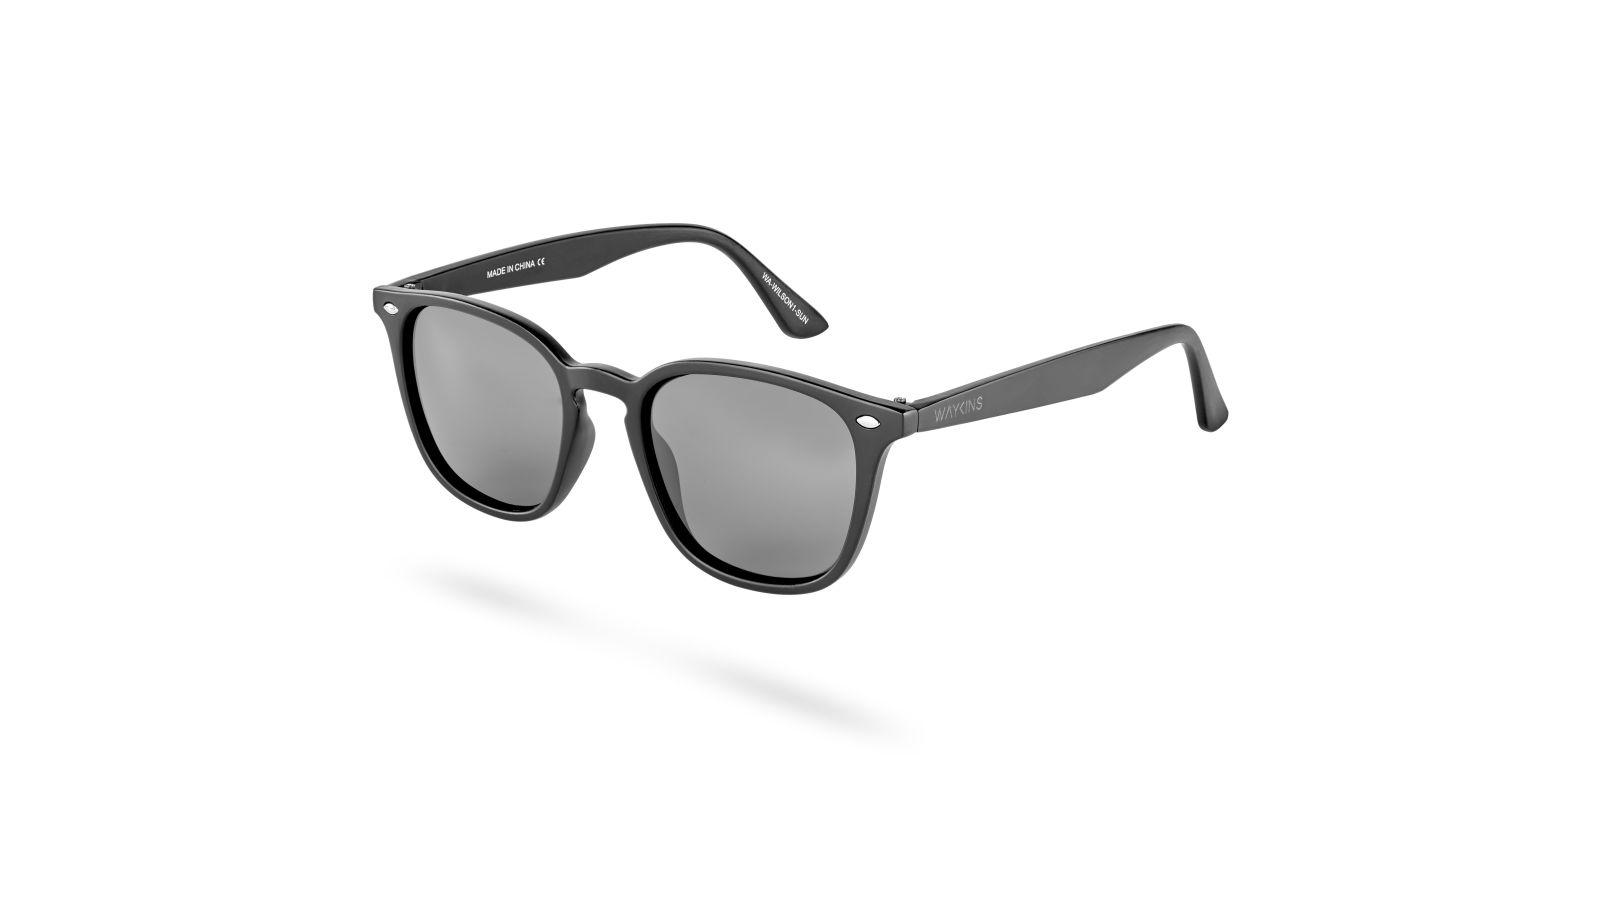 bf62bbea7e Γυαλιά Ηλίου Wilson Black